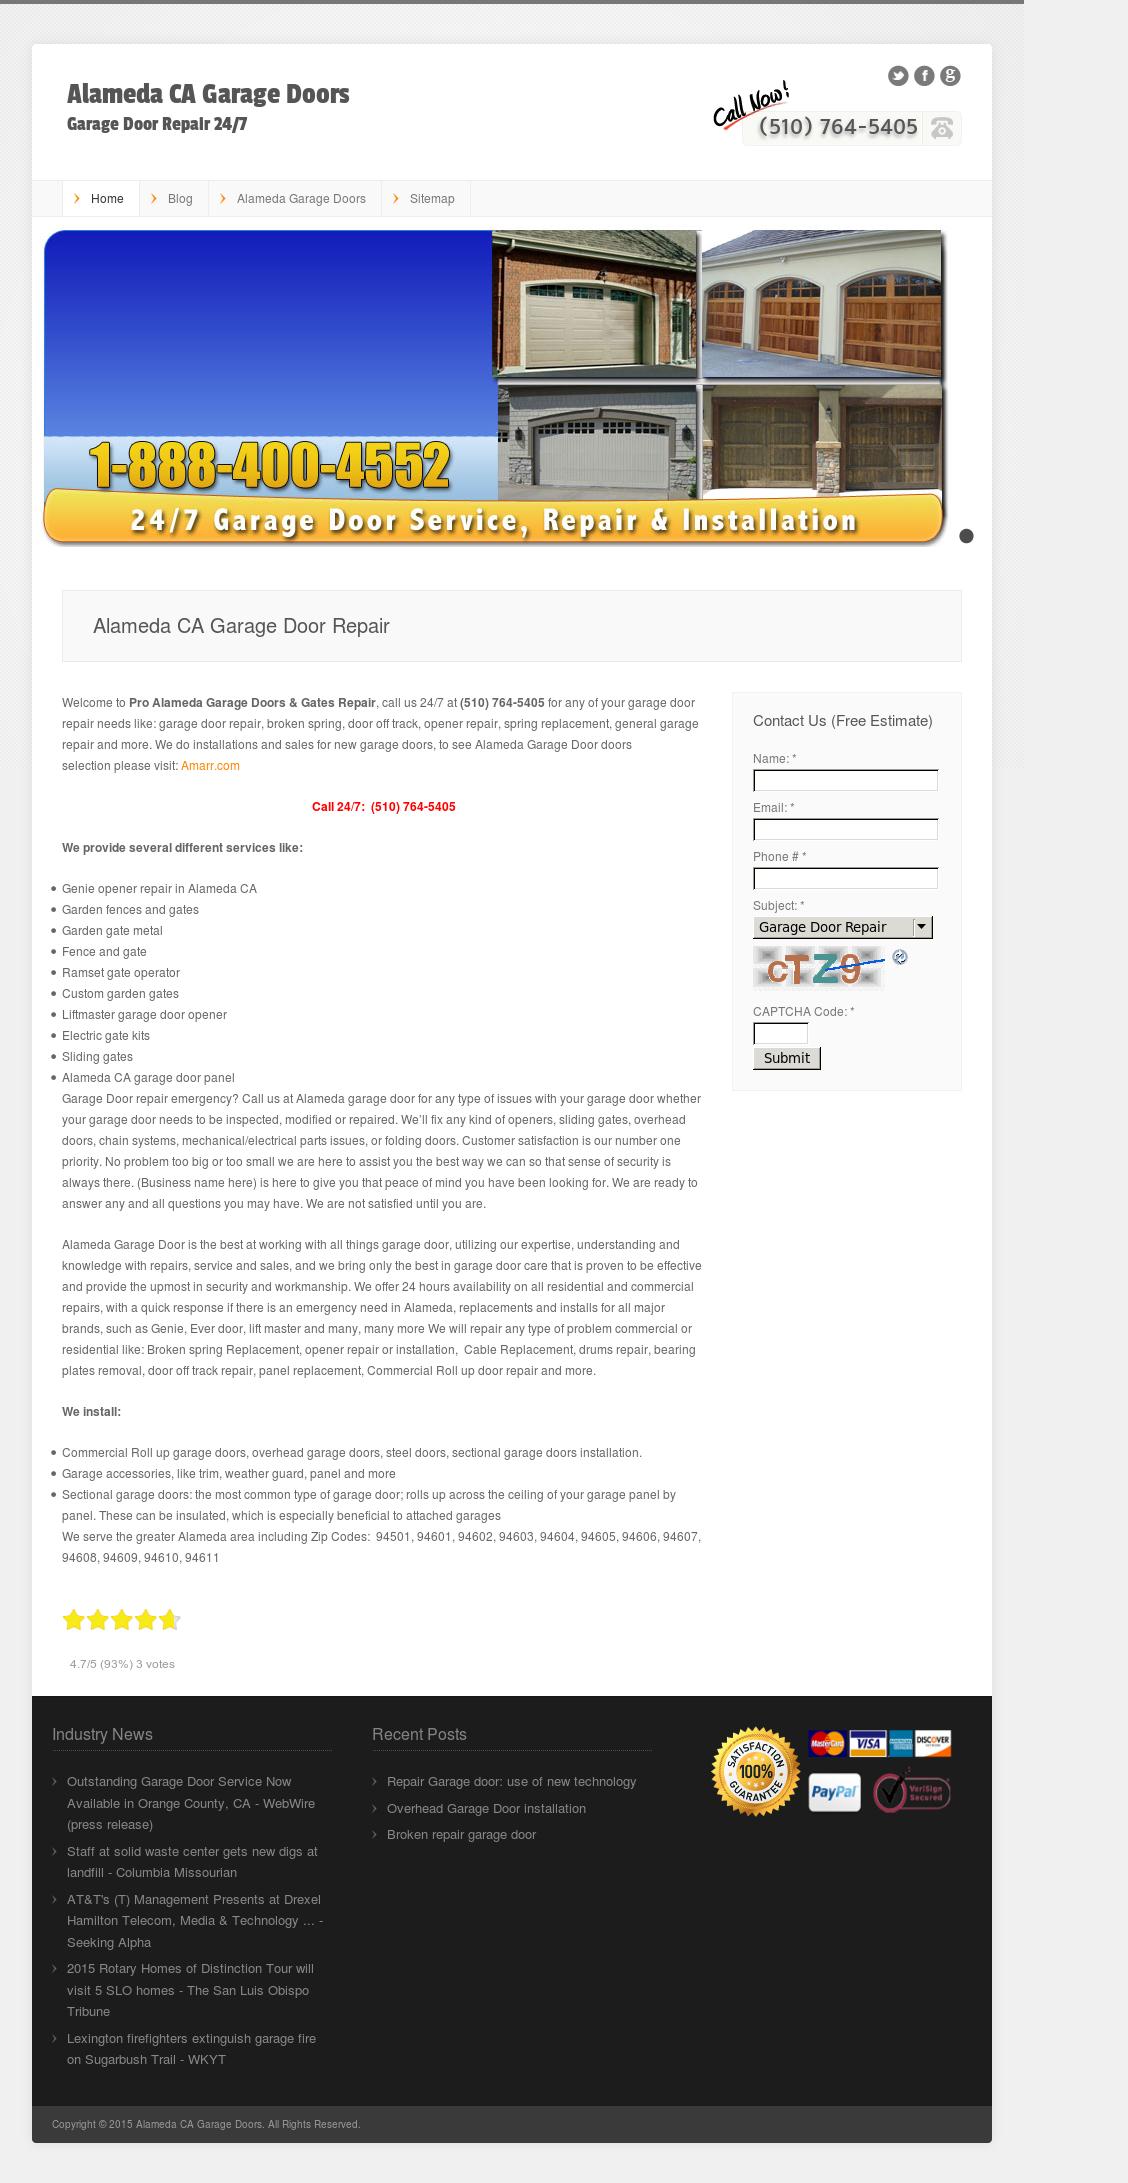 Alameda Ca Garage Doors Competitors Revenue And Employees Owler